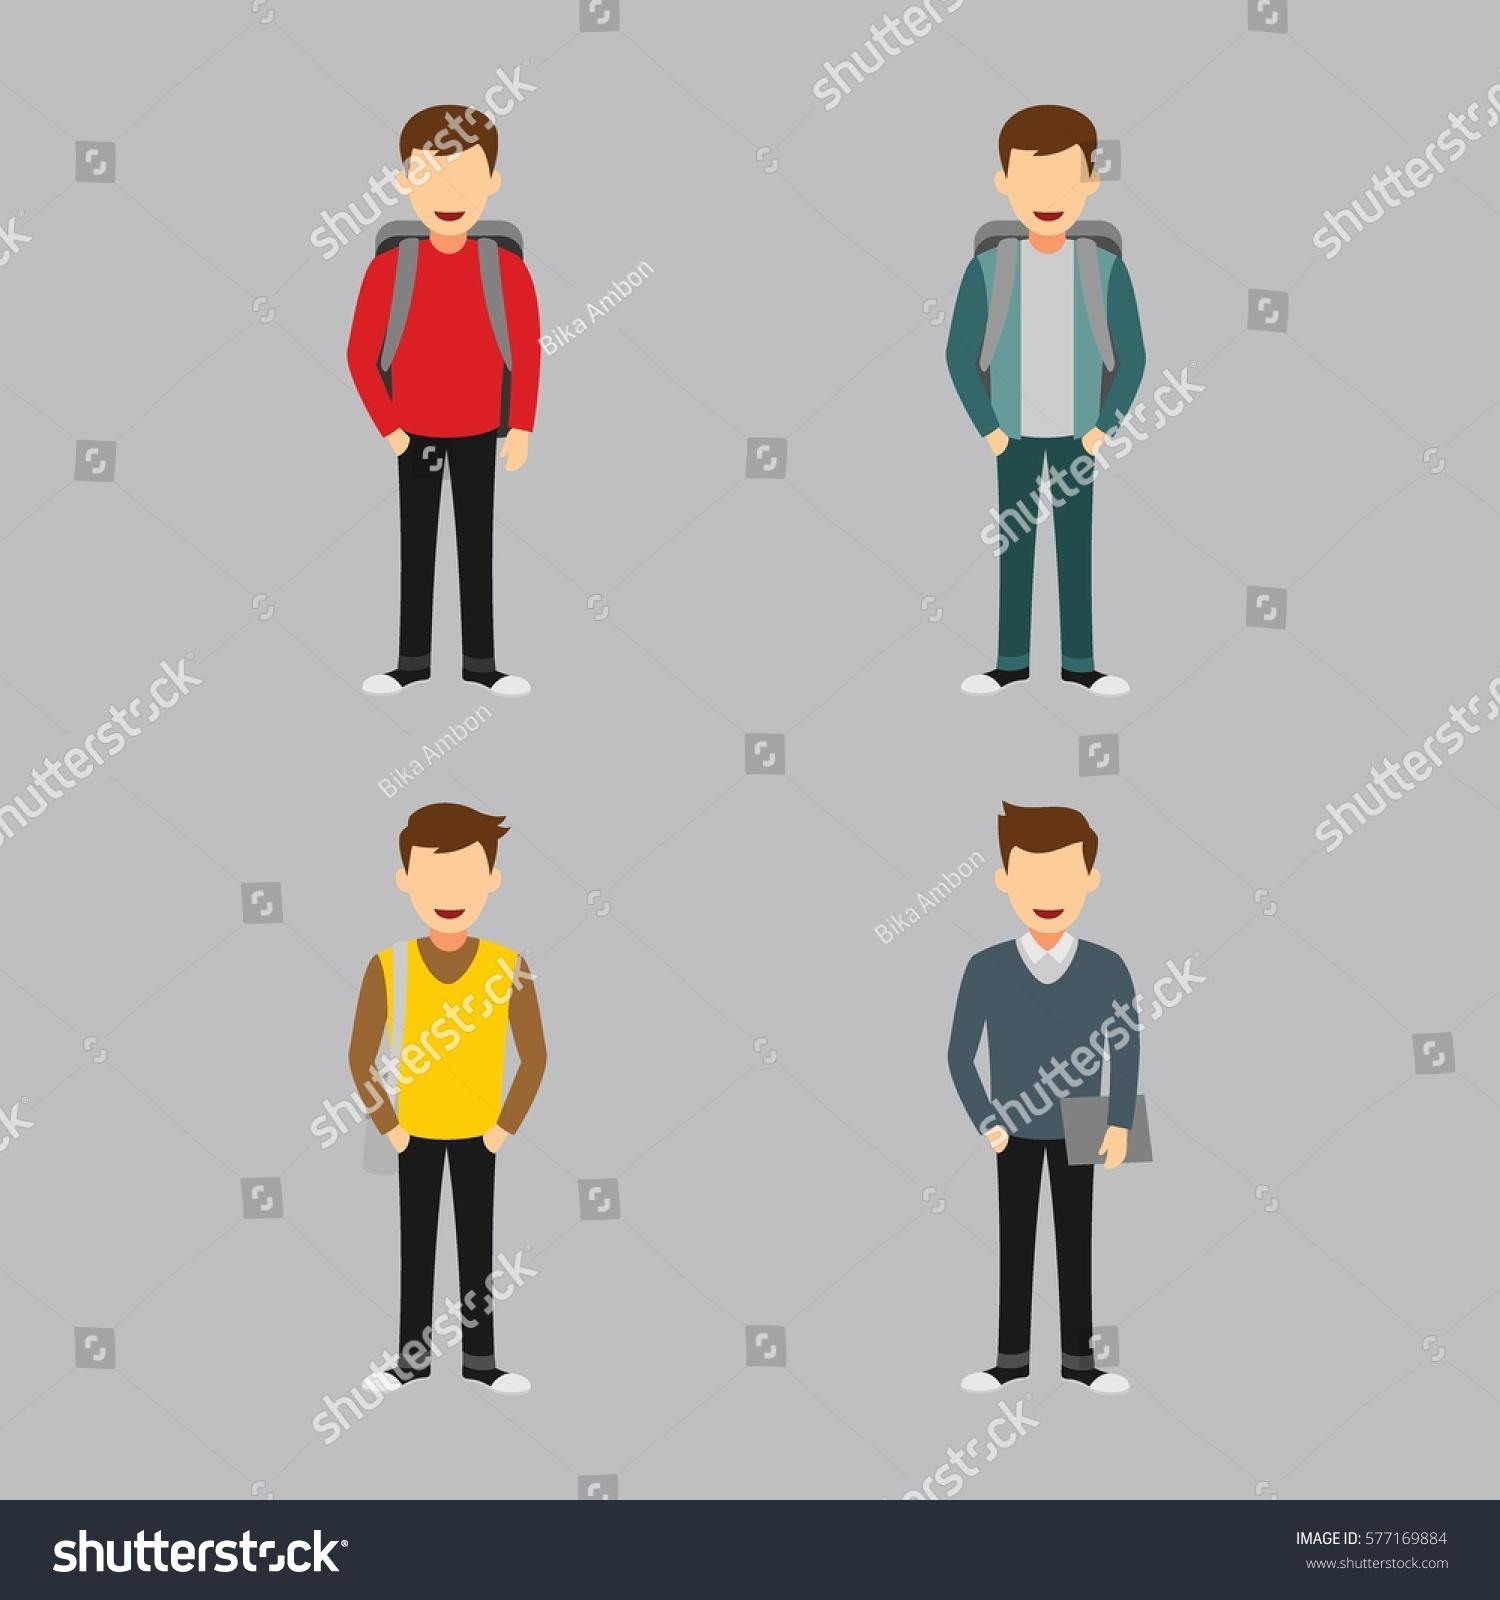 Character Design University : Set university students character design vector stock